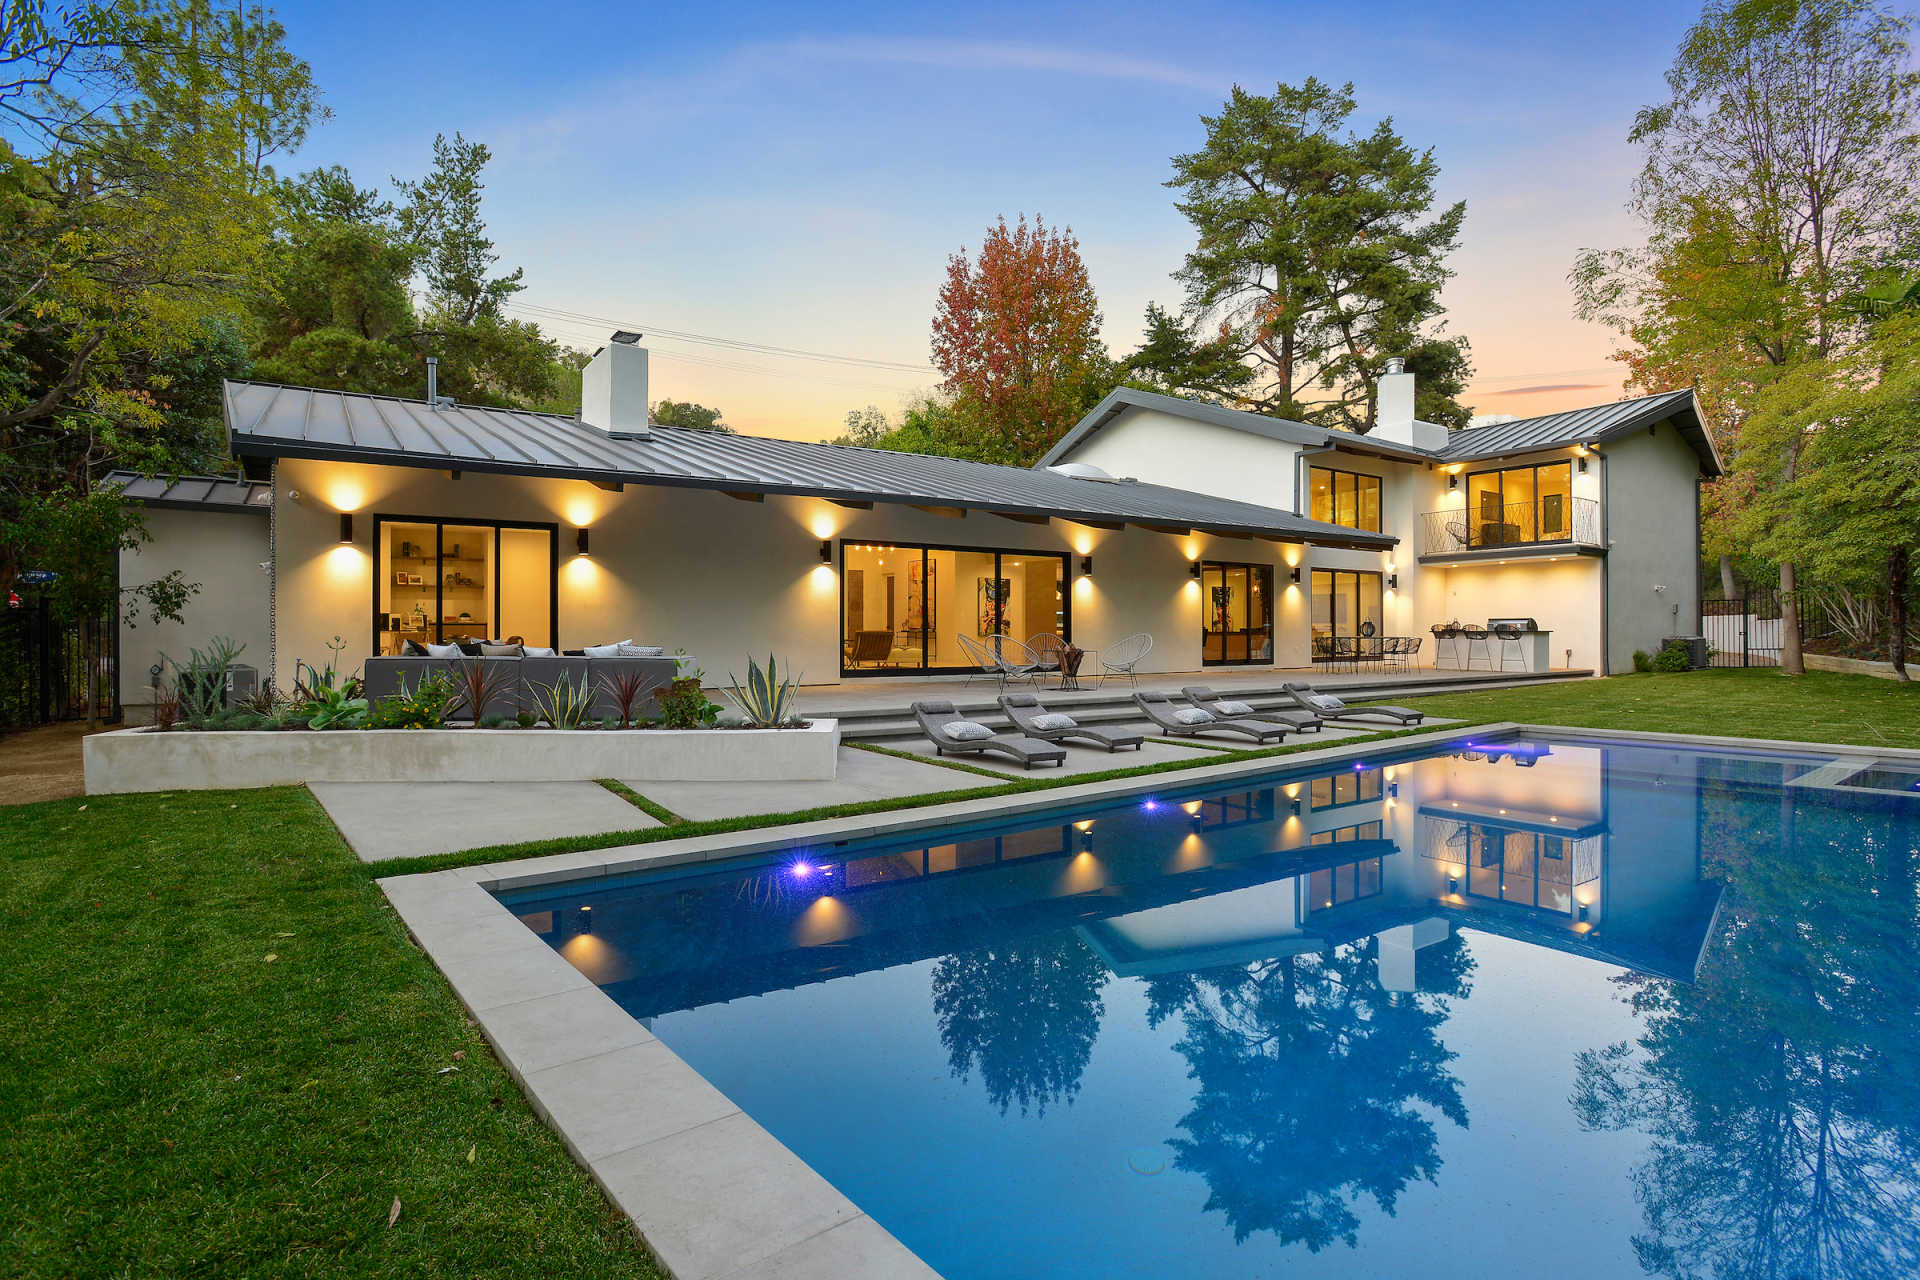 los-angeles-modern-pool-backyard-spa-BBQ